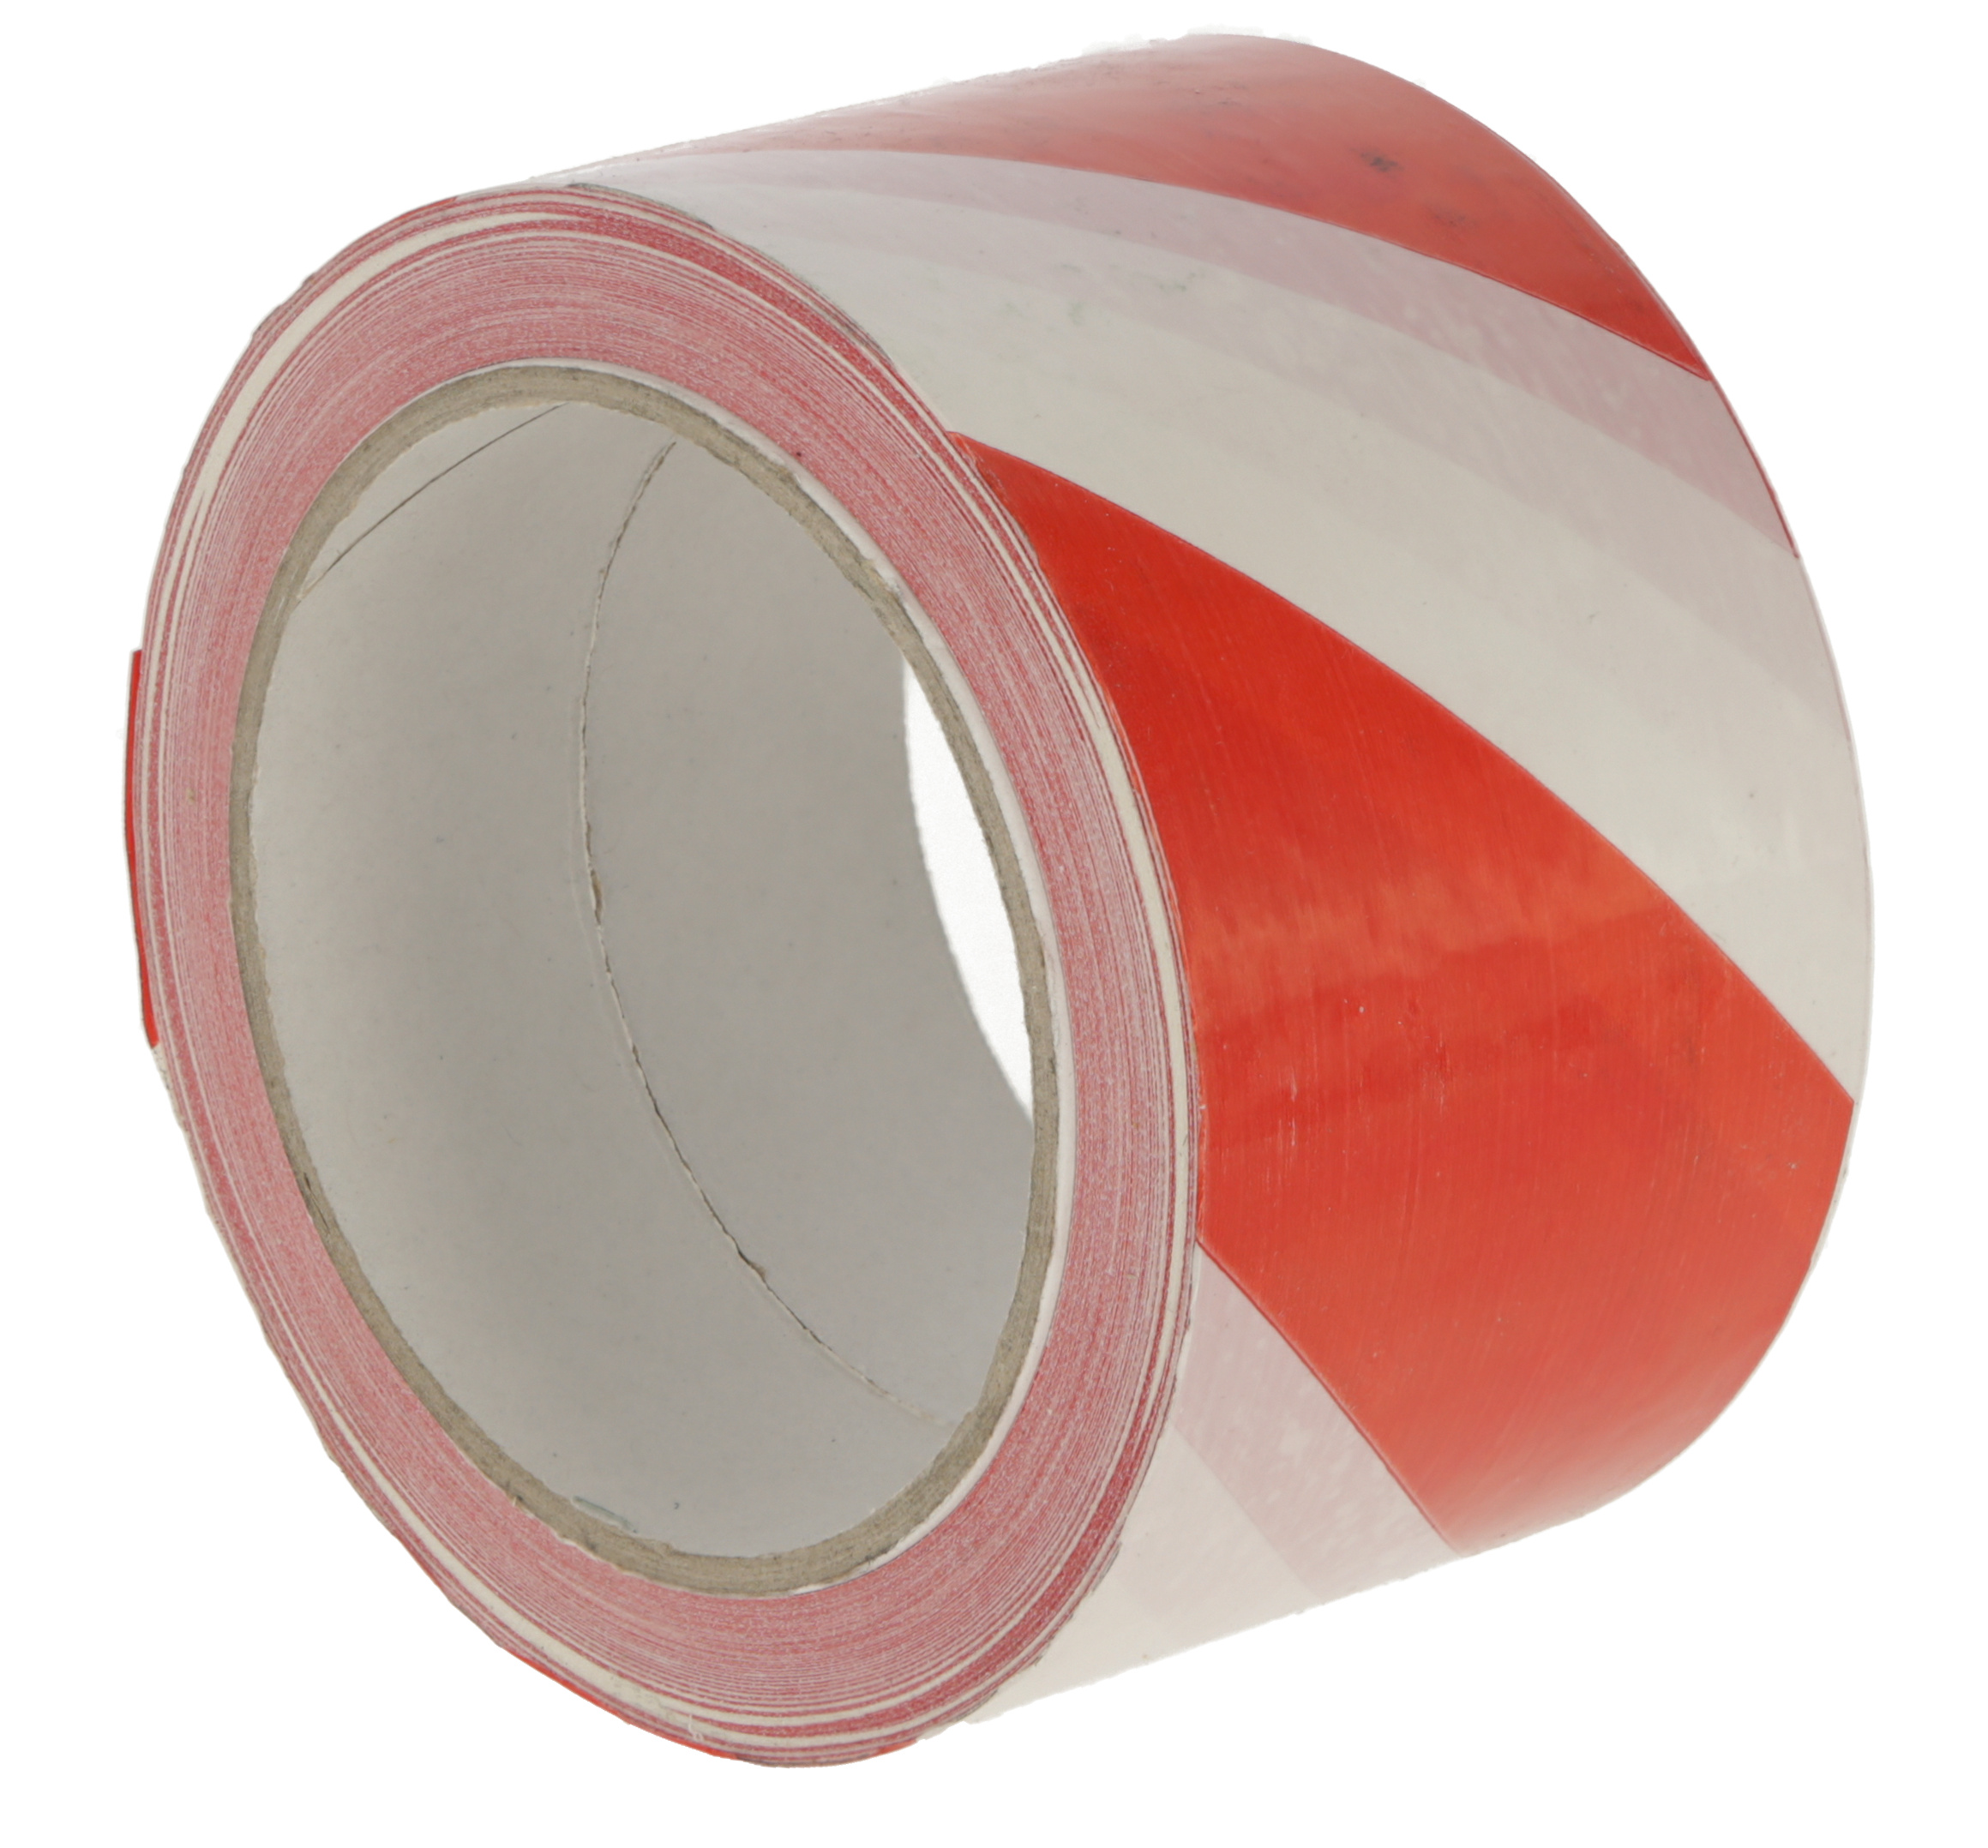 Warnband selbstklebend rot-weiß, 66mx60mm